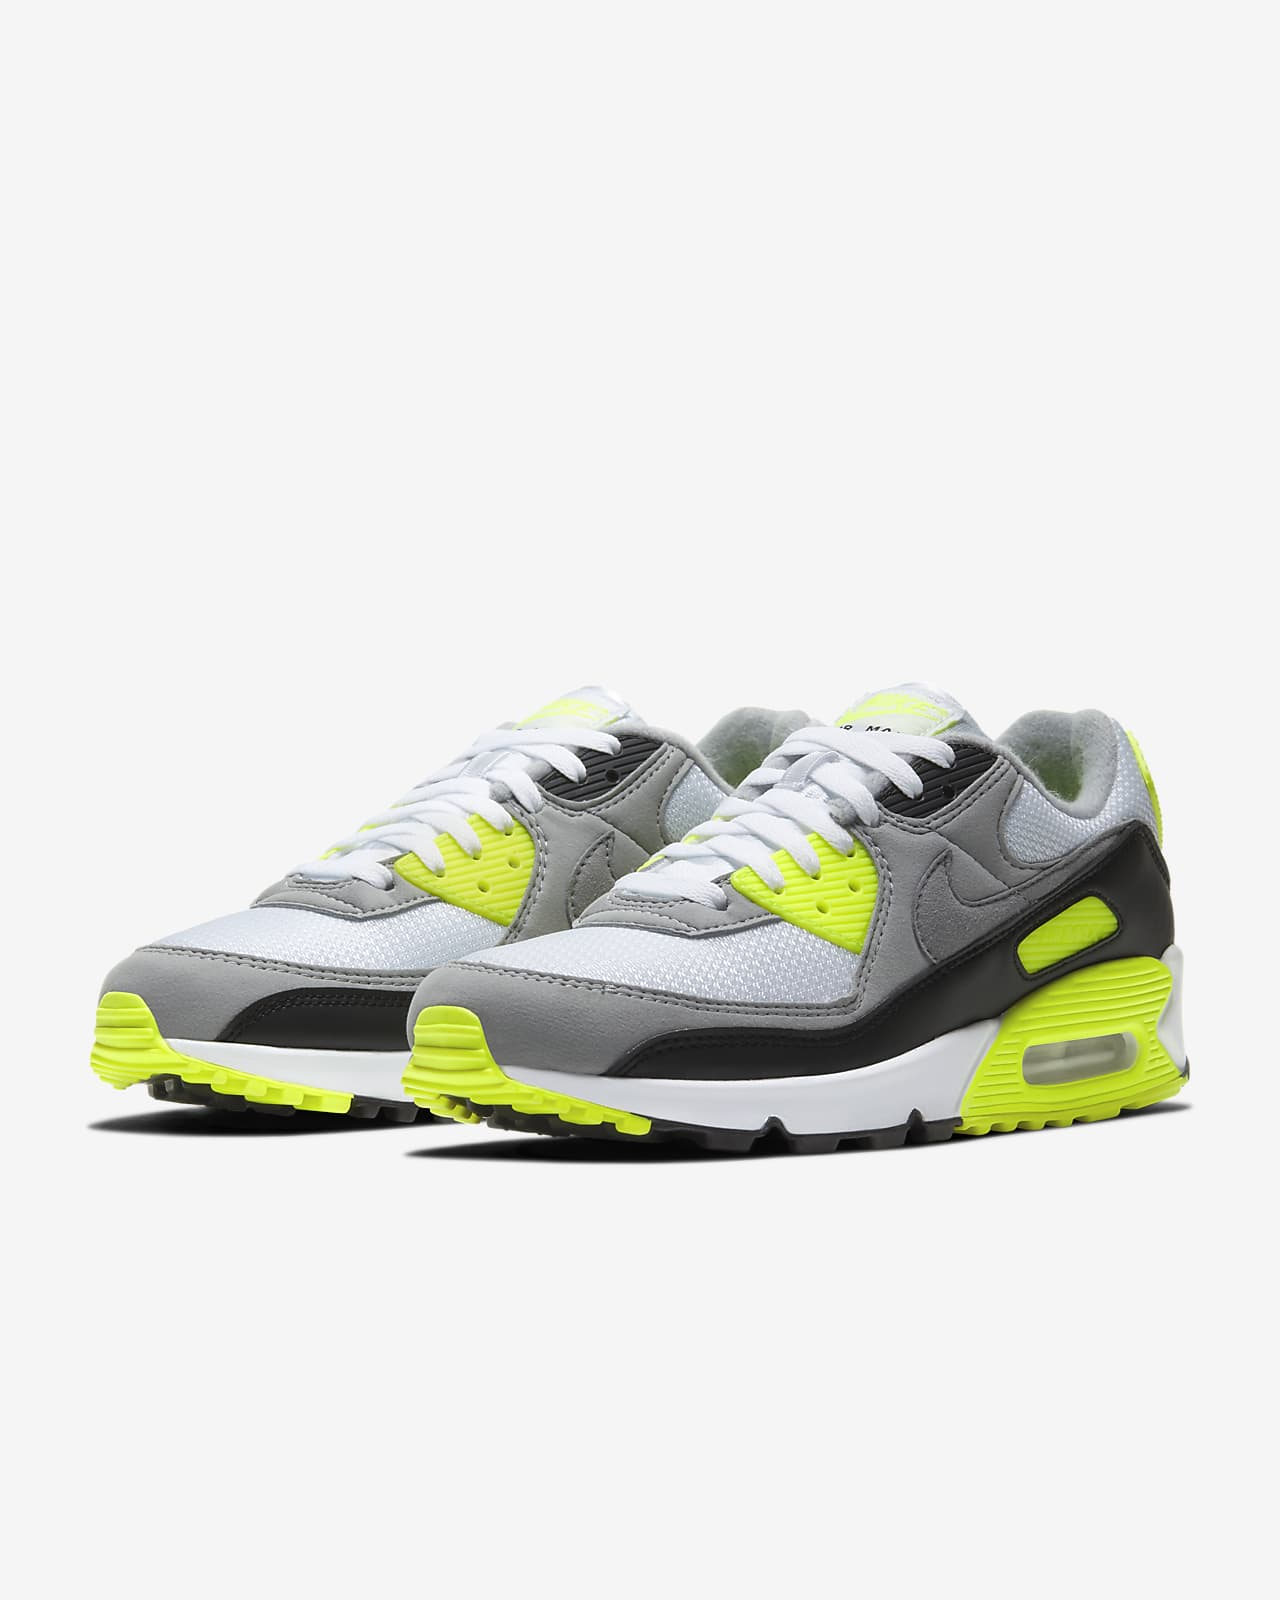 scarpe nike air max uomo fluo